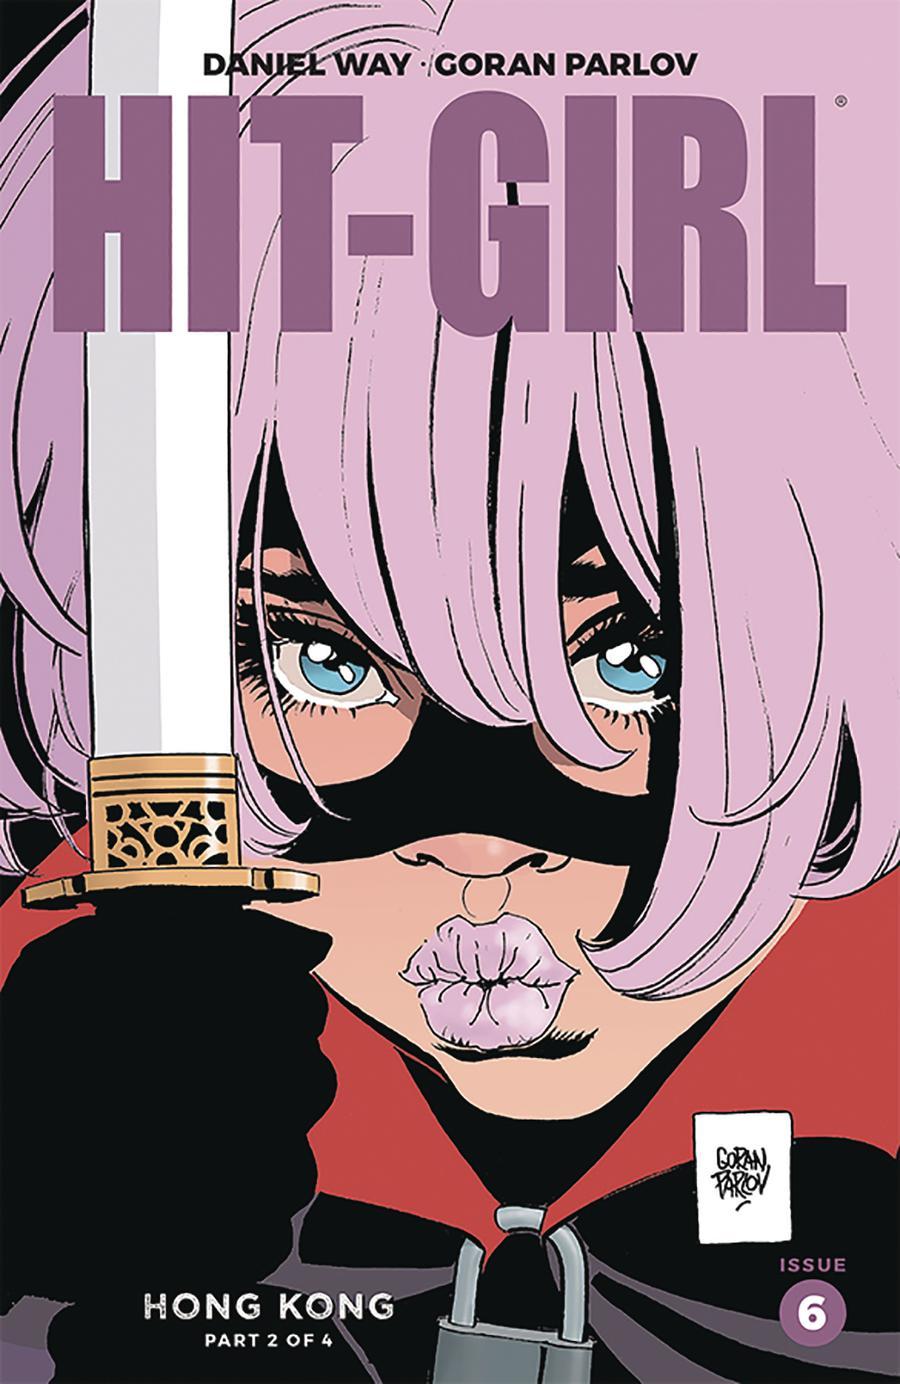 Hit-Girl Vol 2 Season 2 #6 Cover A Regular Goran Parlov Color Cover